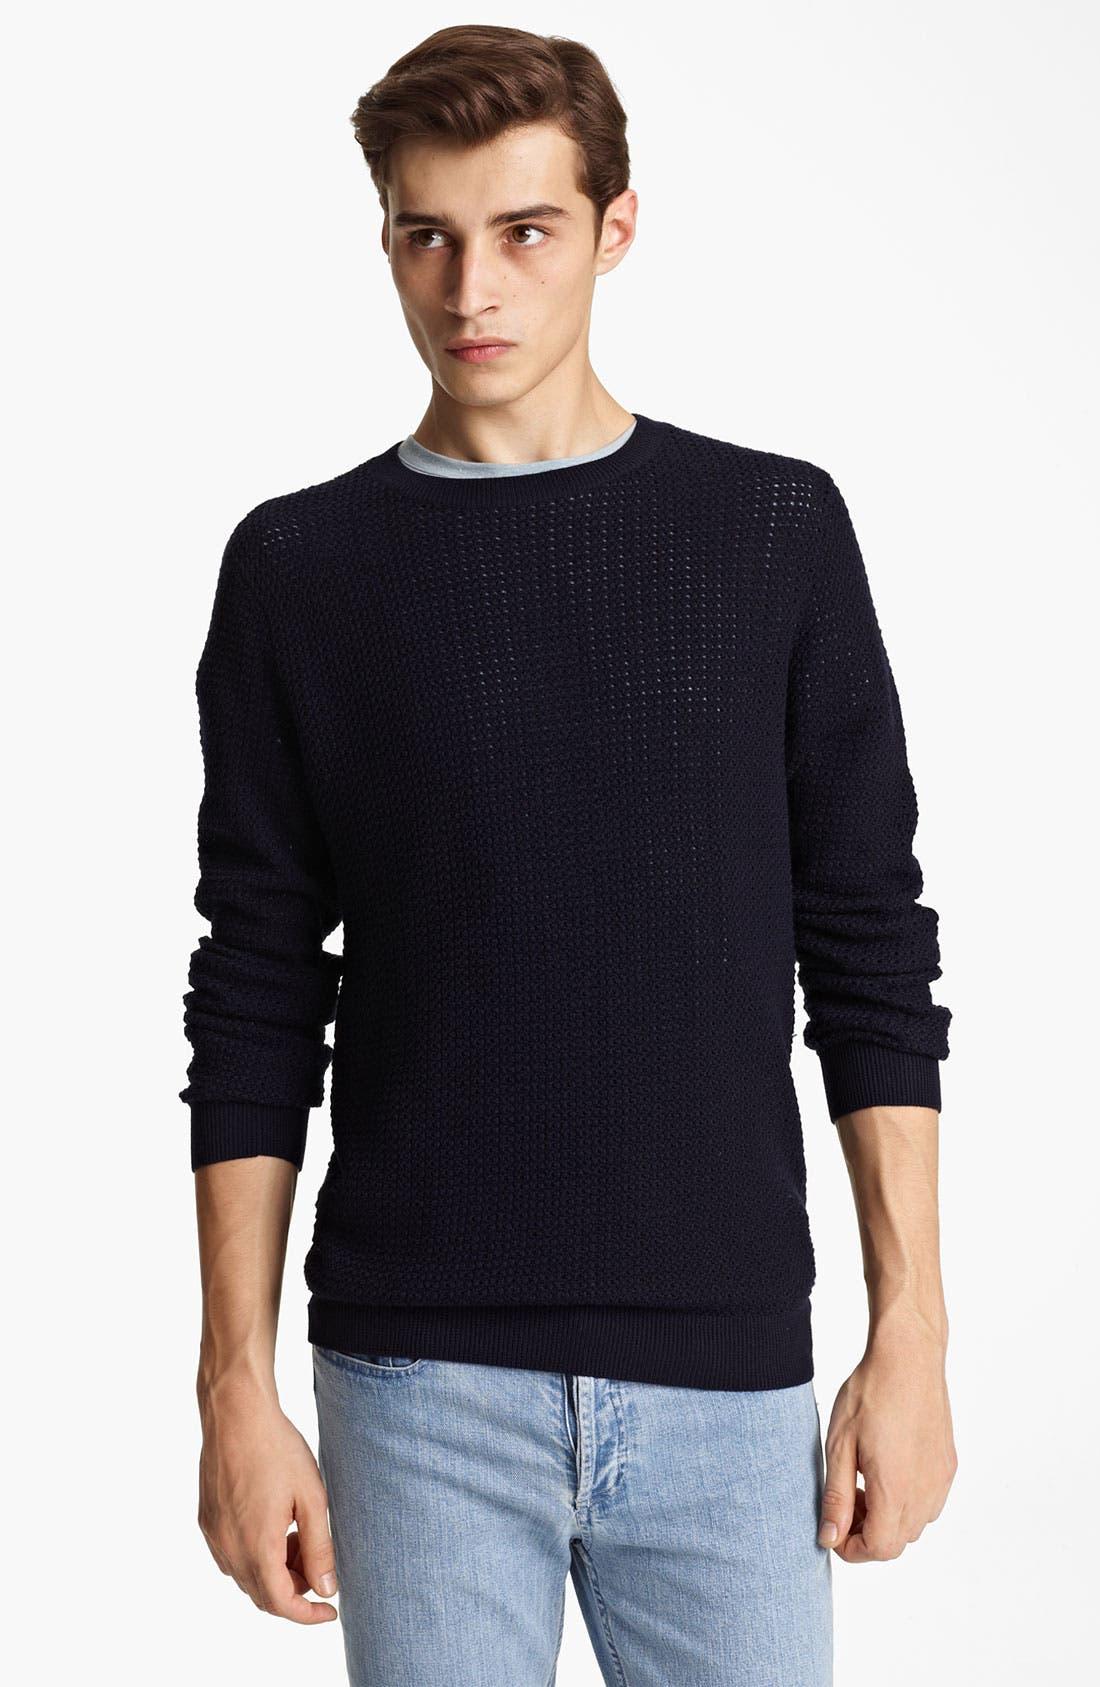 Alternate Image 1 Selected - A.P.C. Perforated Crewneck Sweater